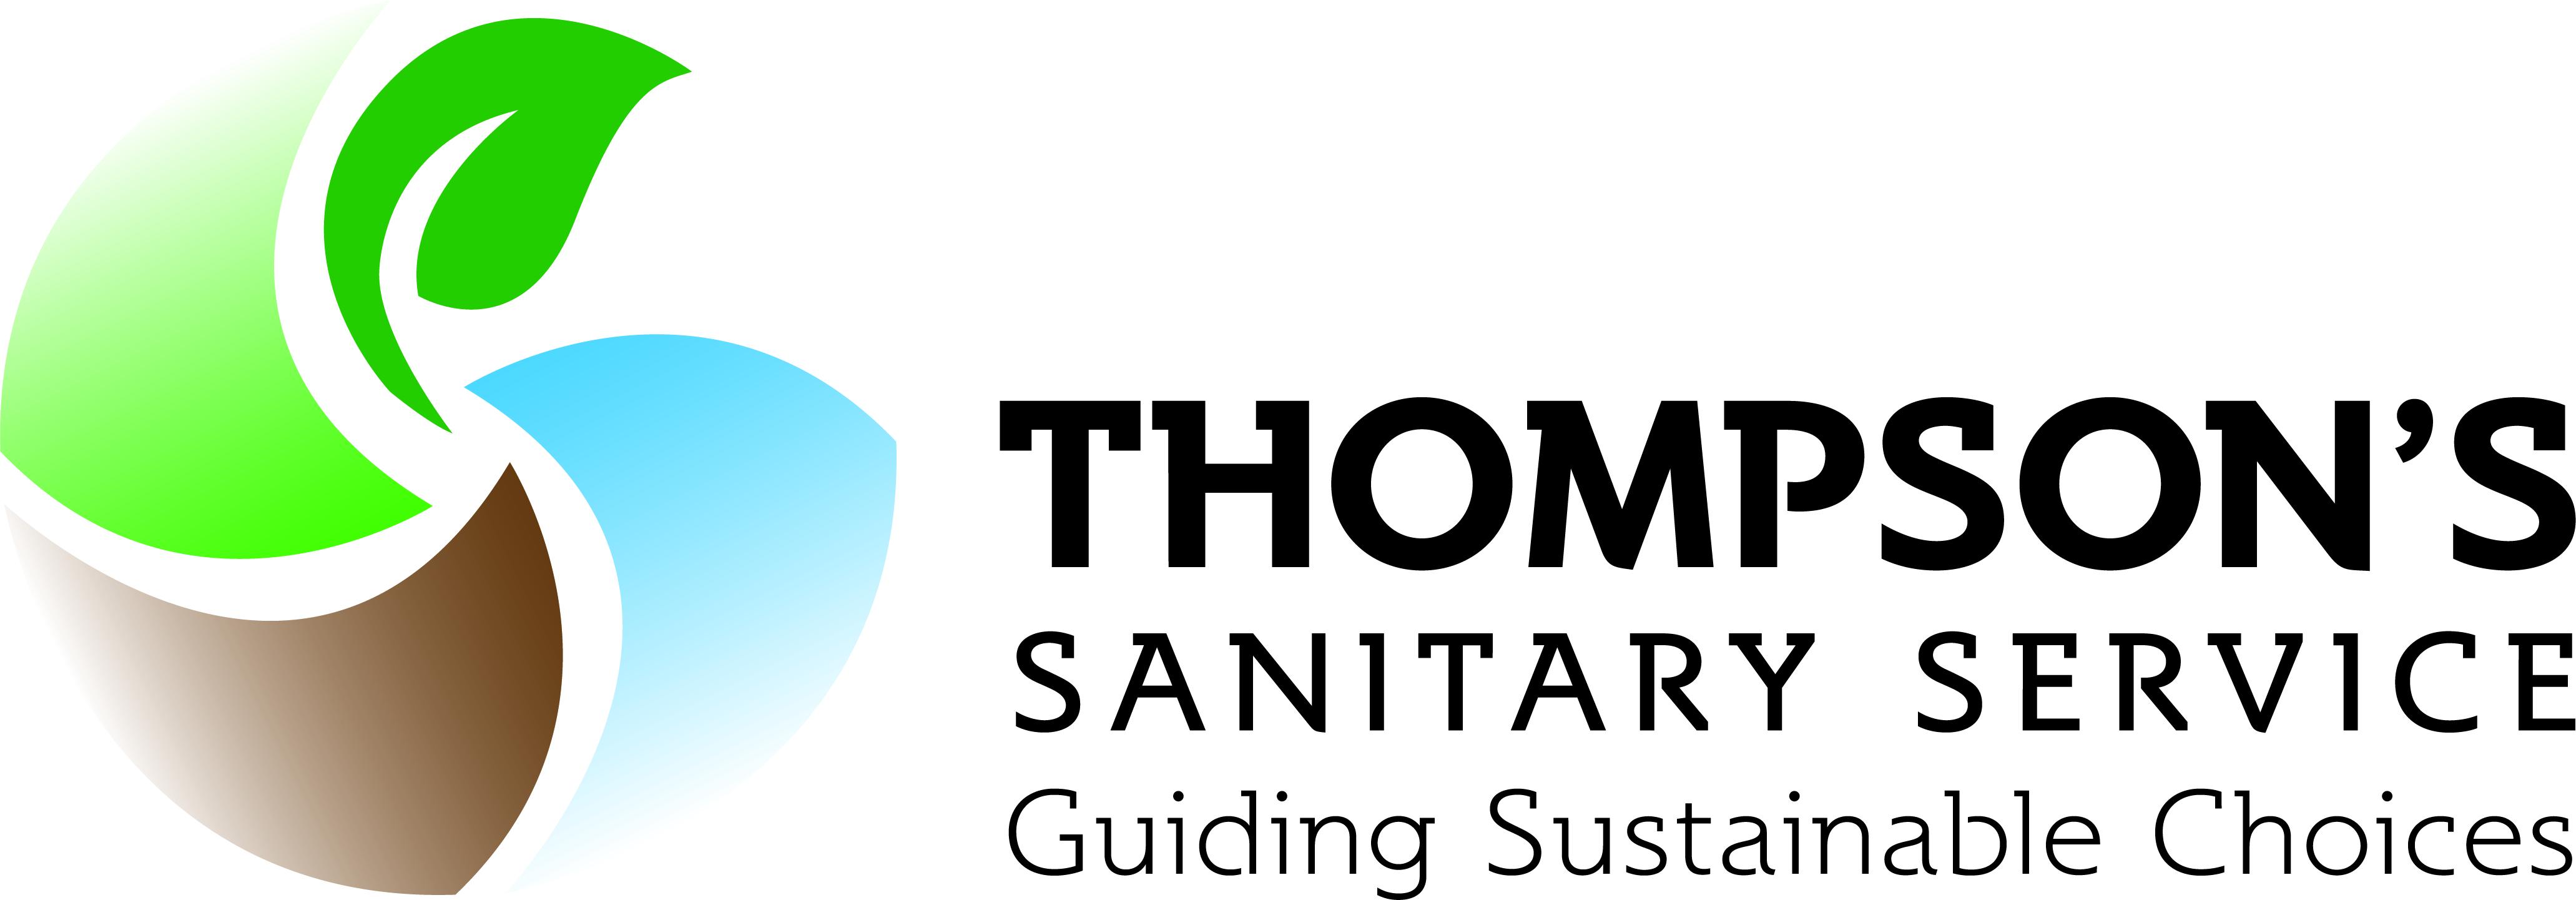 Thompsons-Sanitary-logo